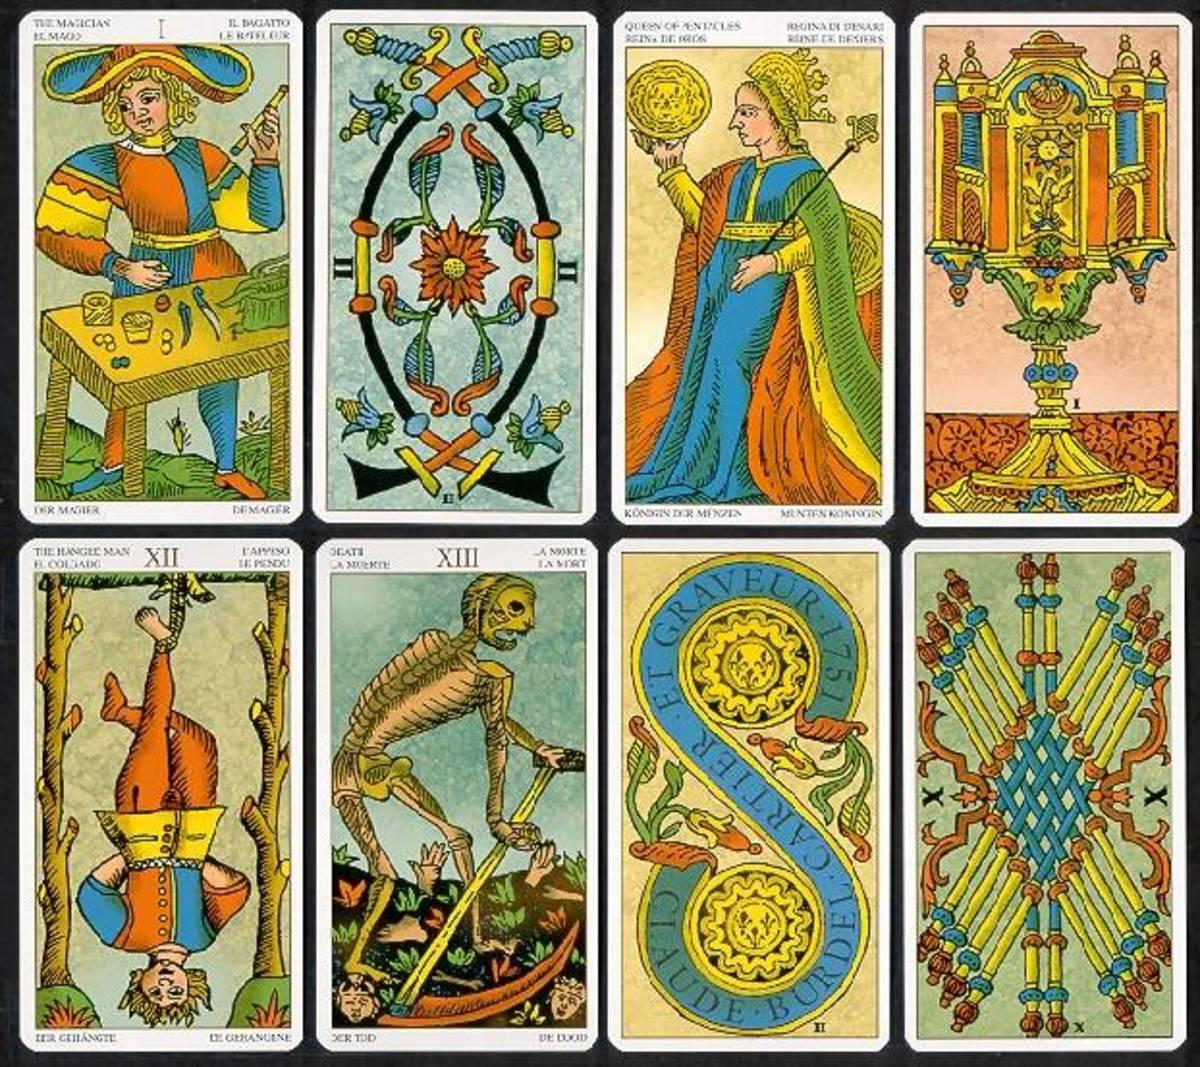 The Influence of Tarot